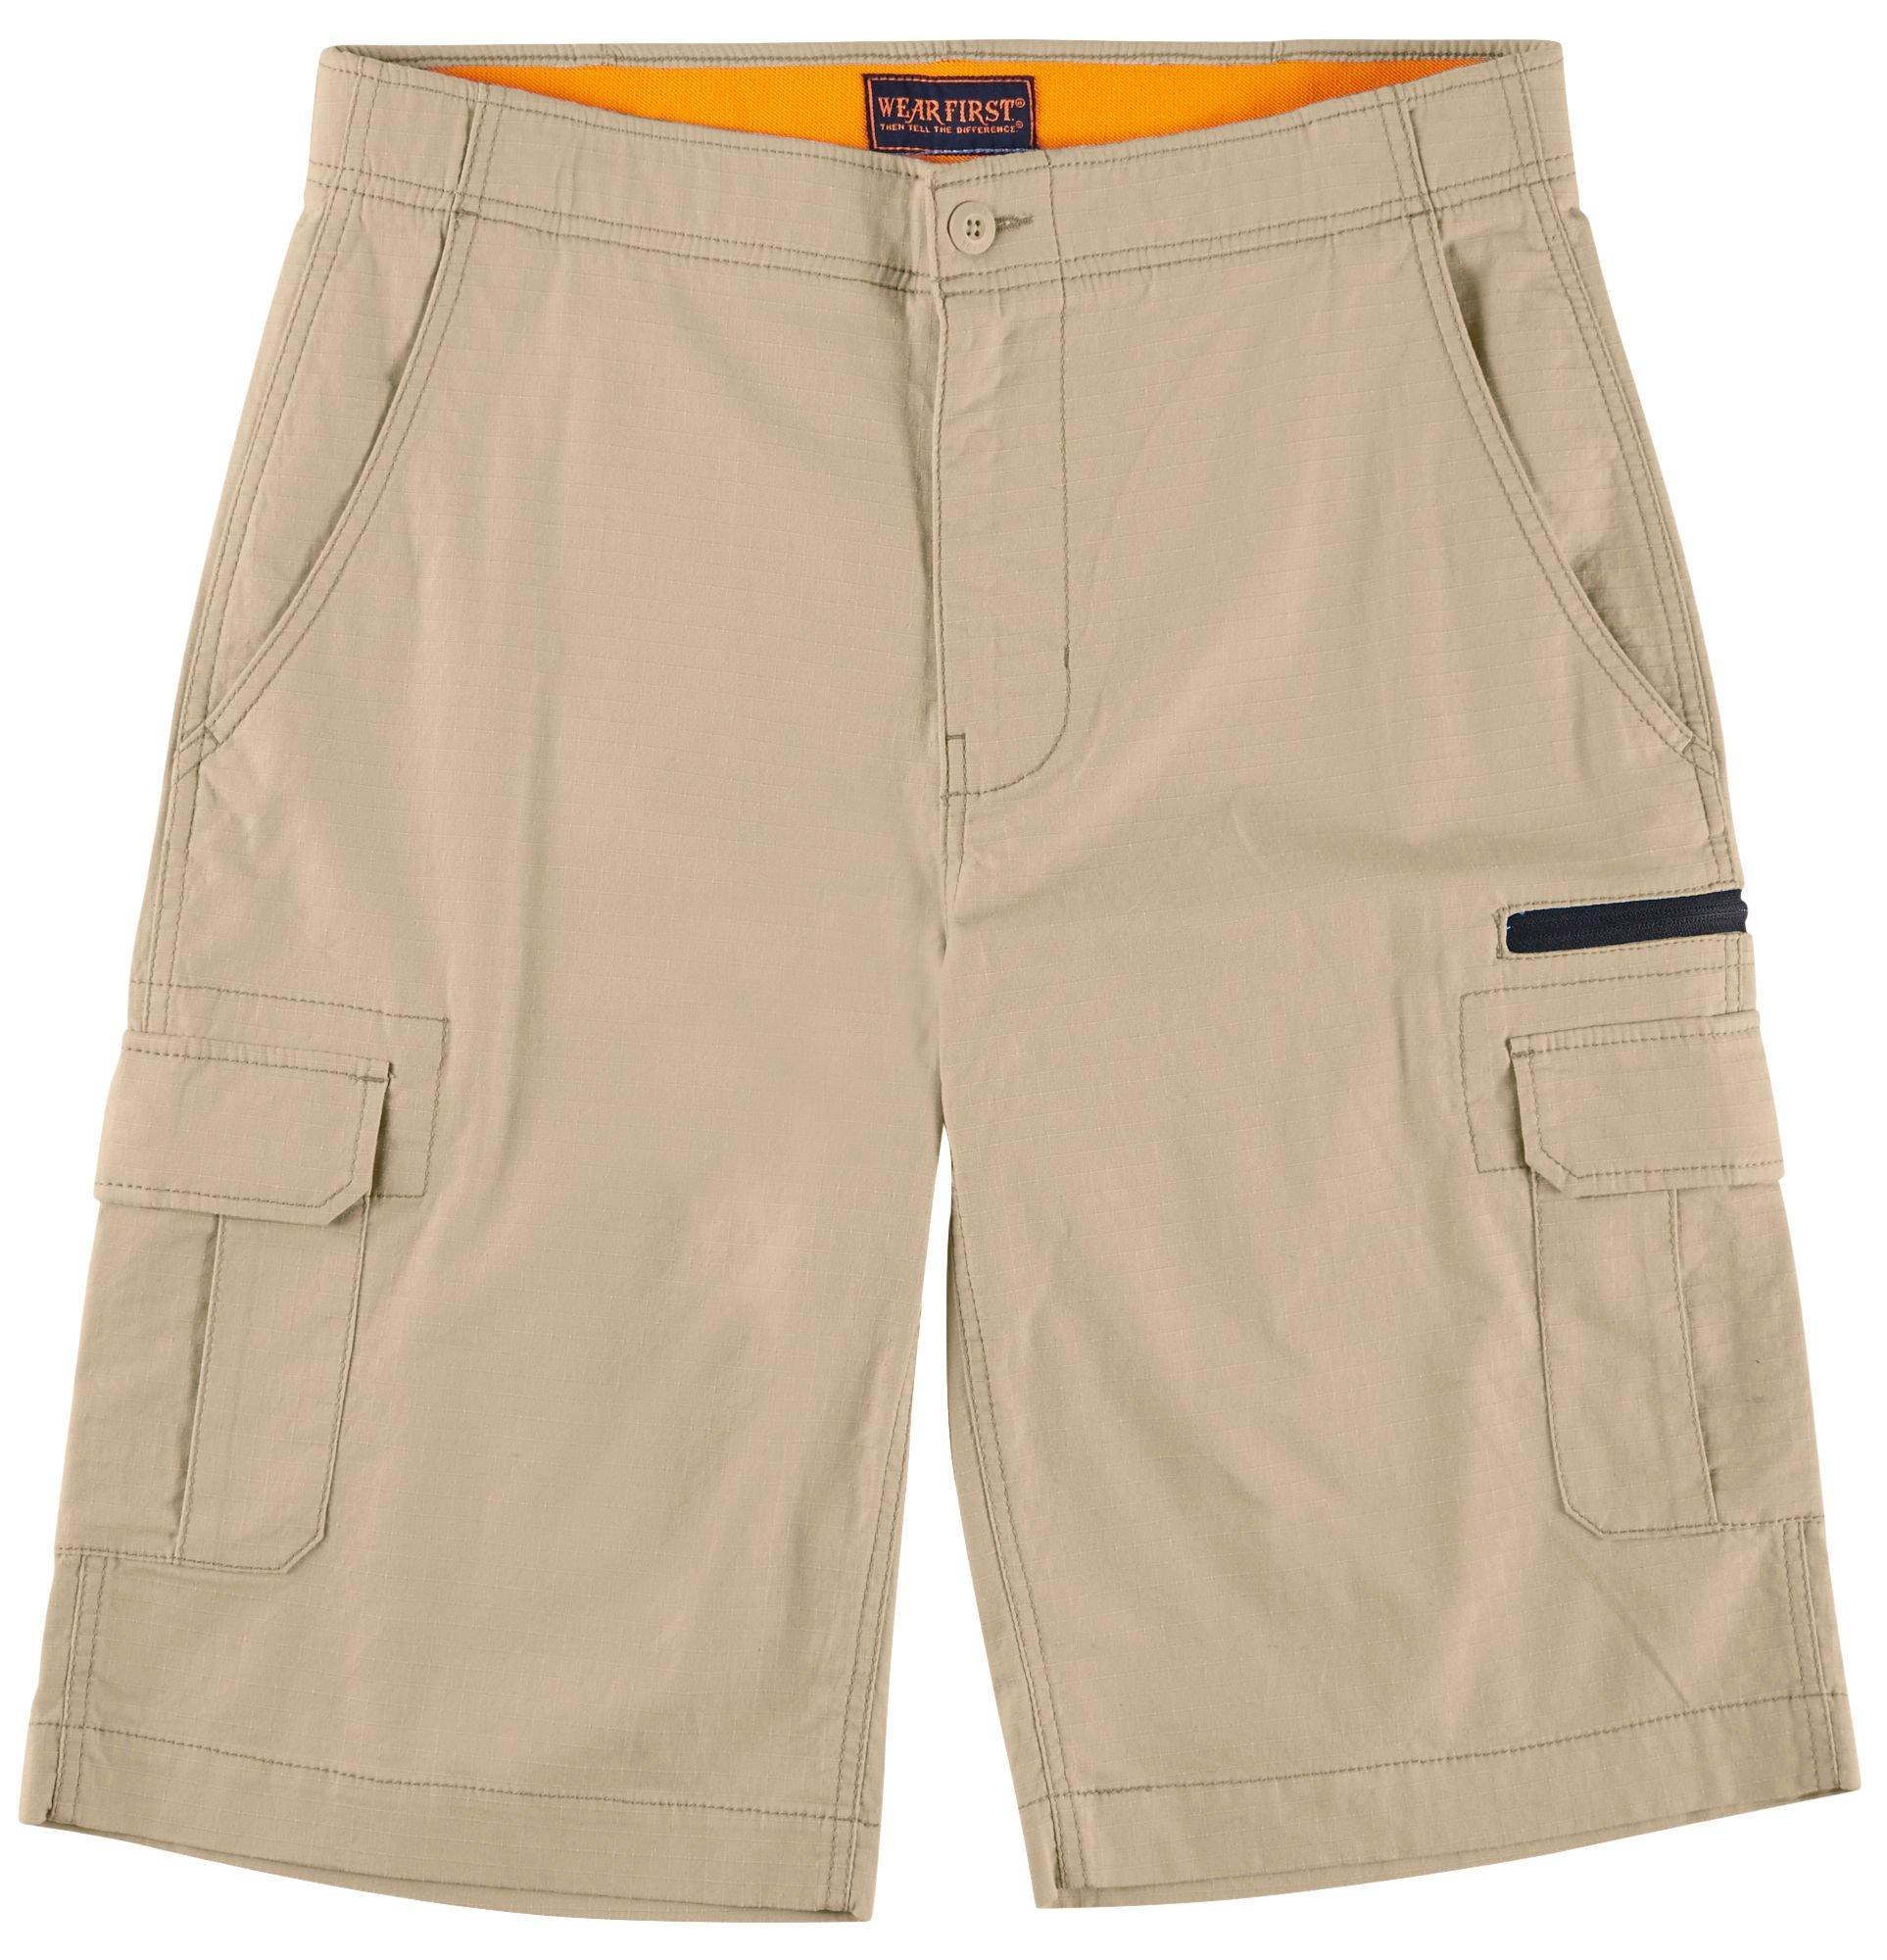 Wearfirst mens shorts